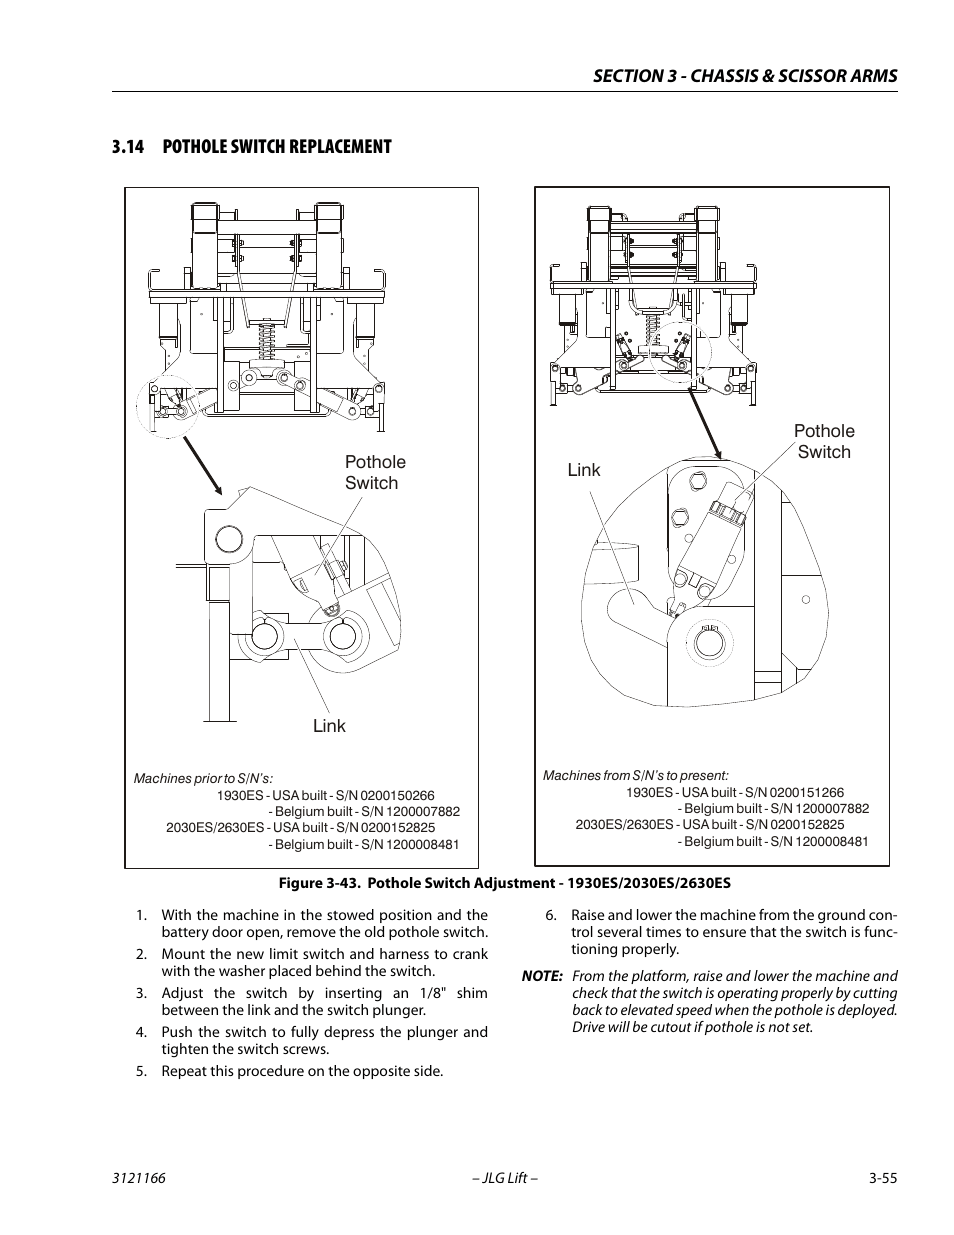 jlg 3246es service manual page91?resize=665%2C861 jlg 2030 wiring diagram jlg foot pedal wiring, jlg parts diagram jlg 40h wiring diagram at n-0.co